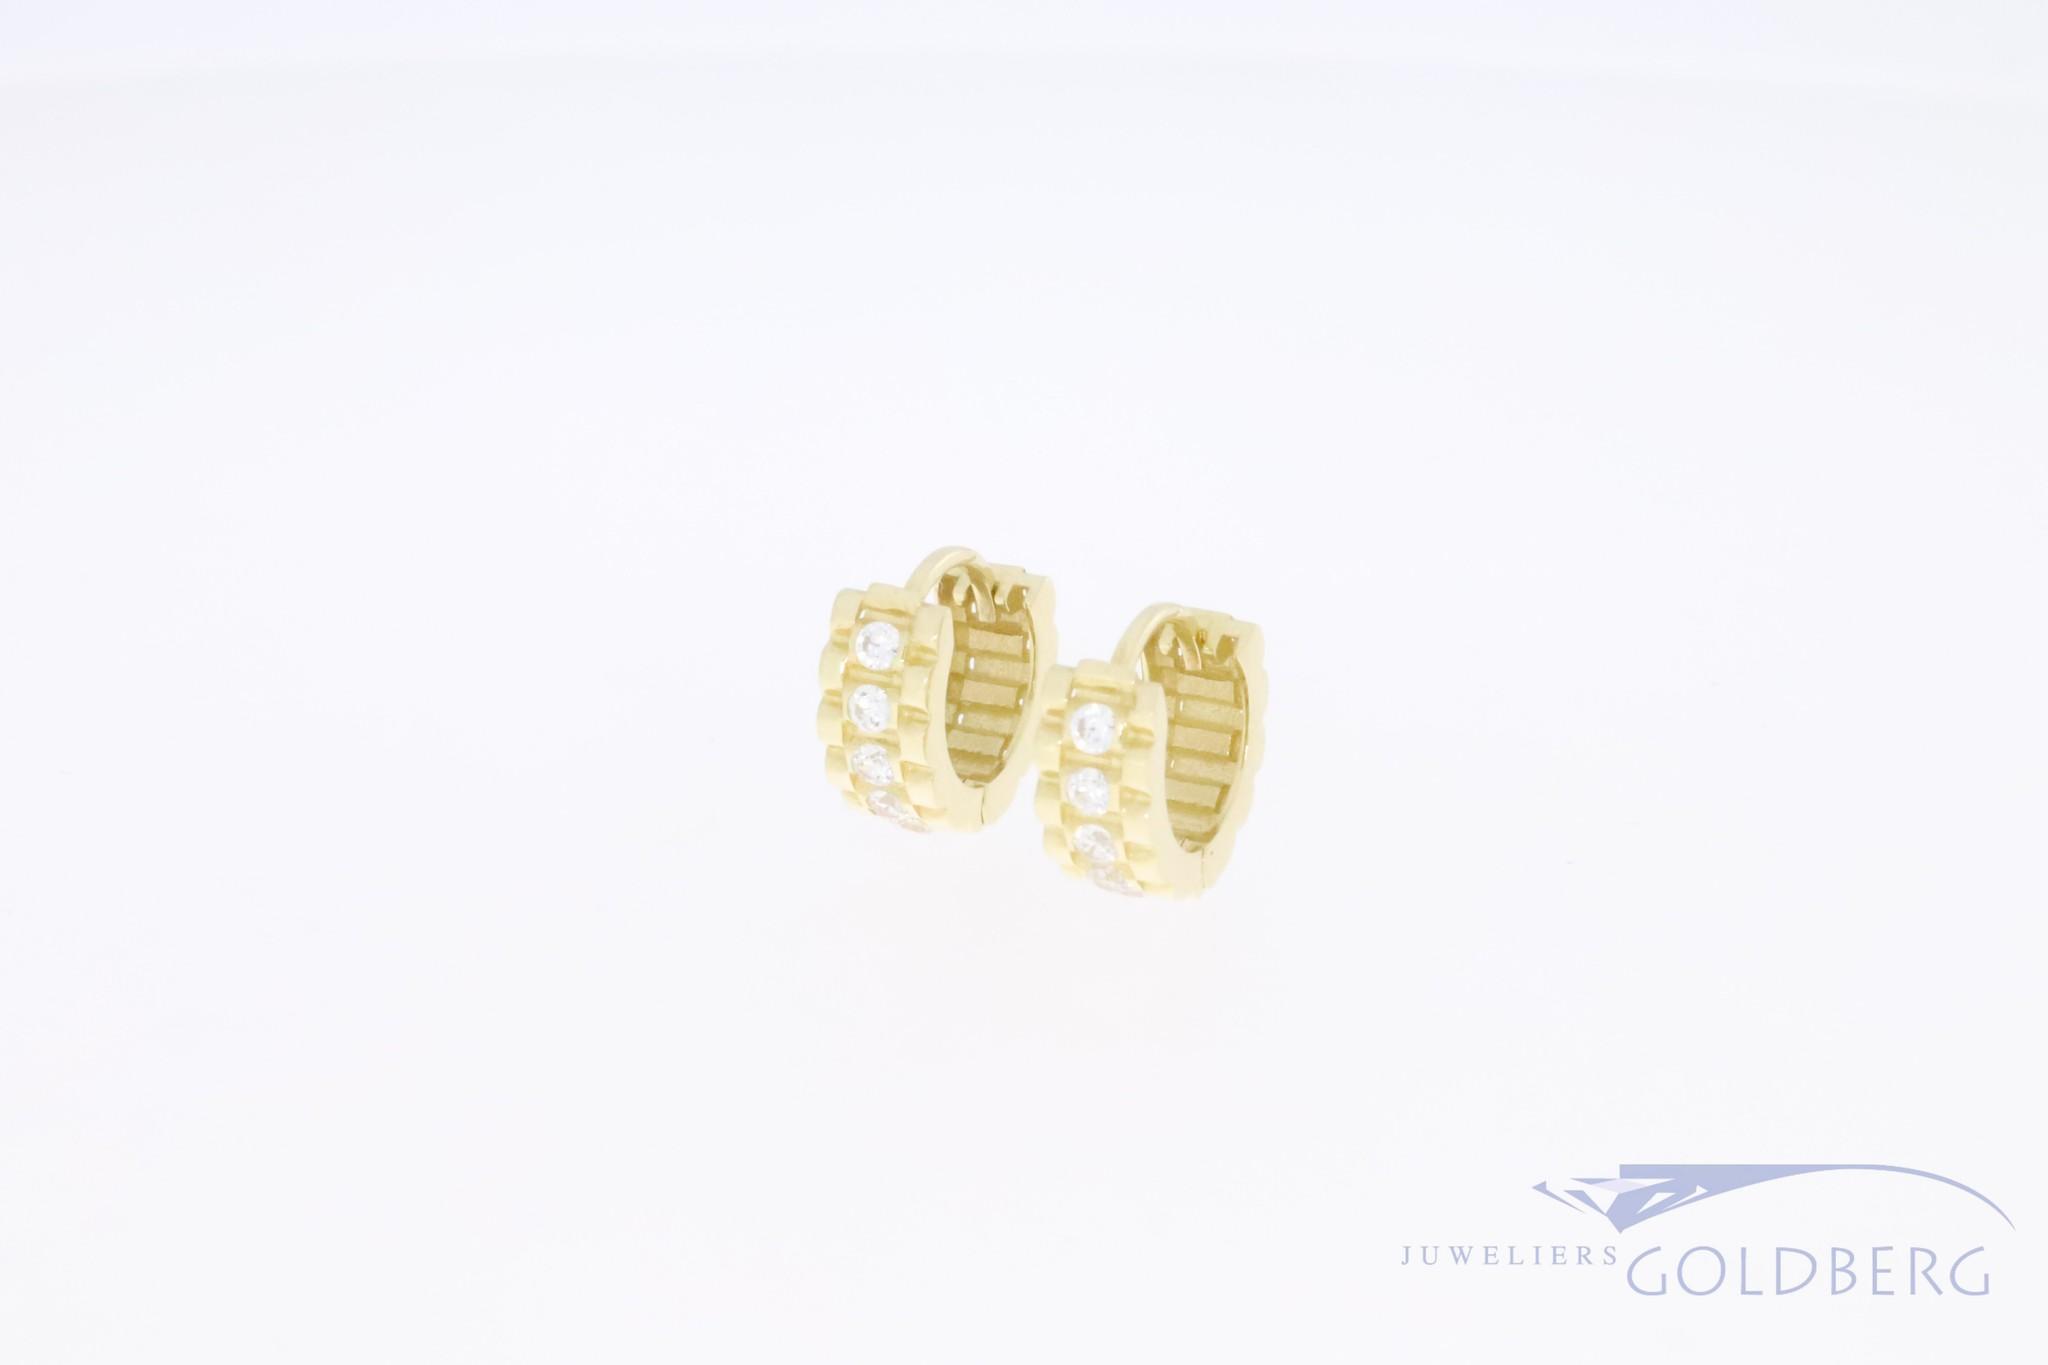 Sturdy 14k gold retro earrings with zirconia's